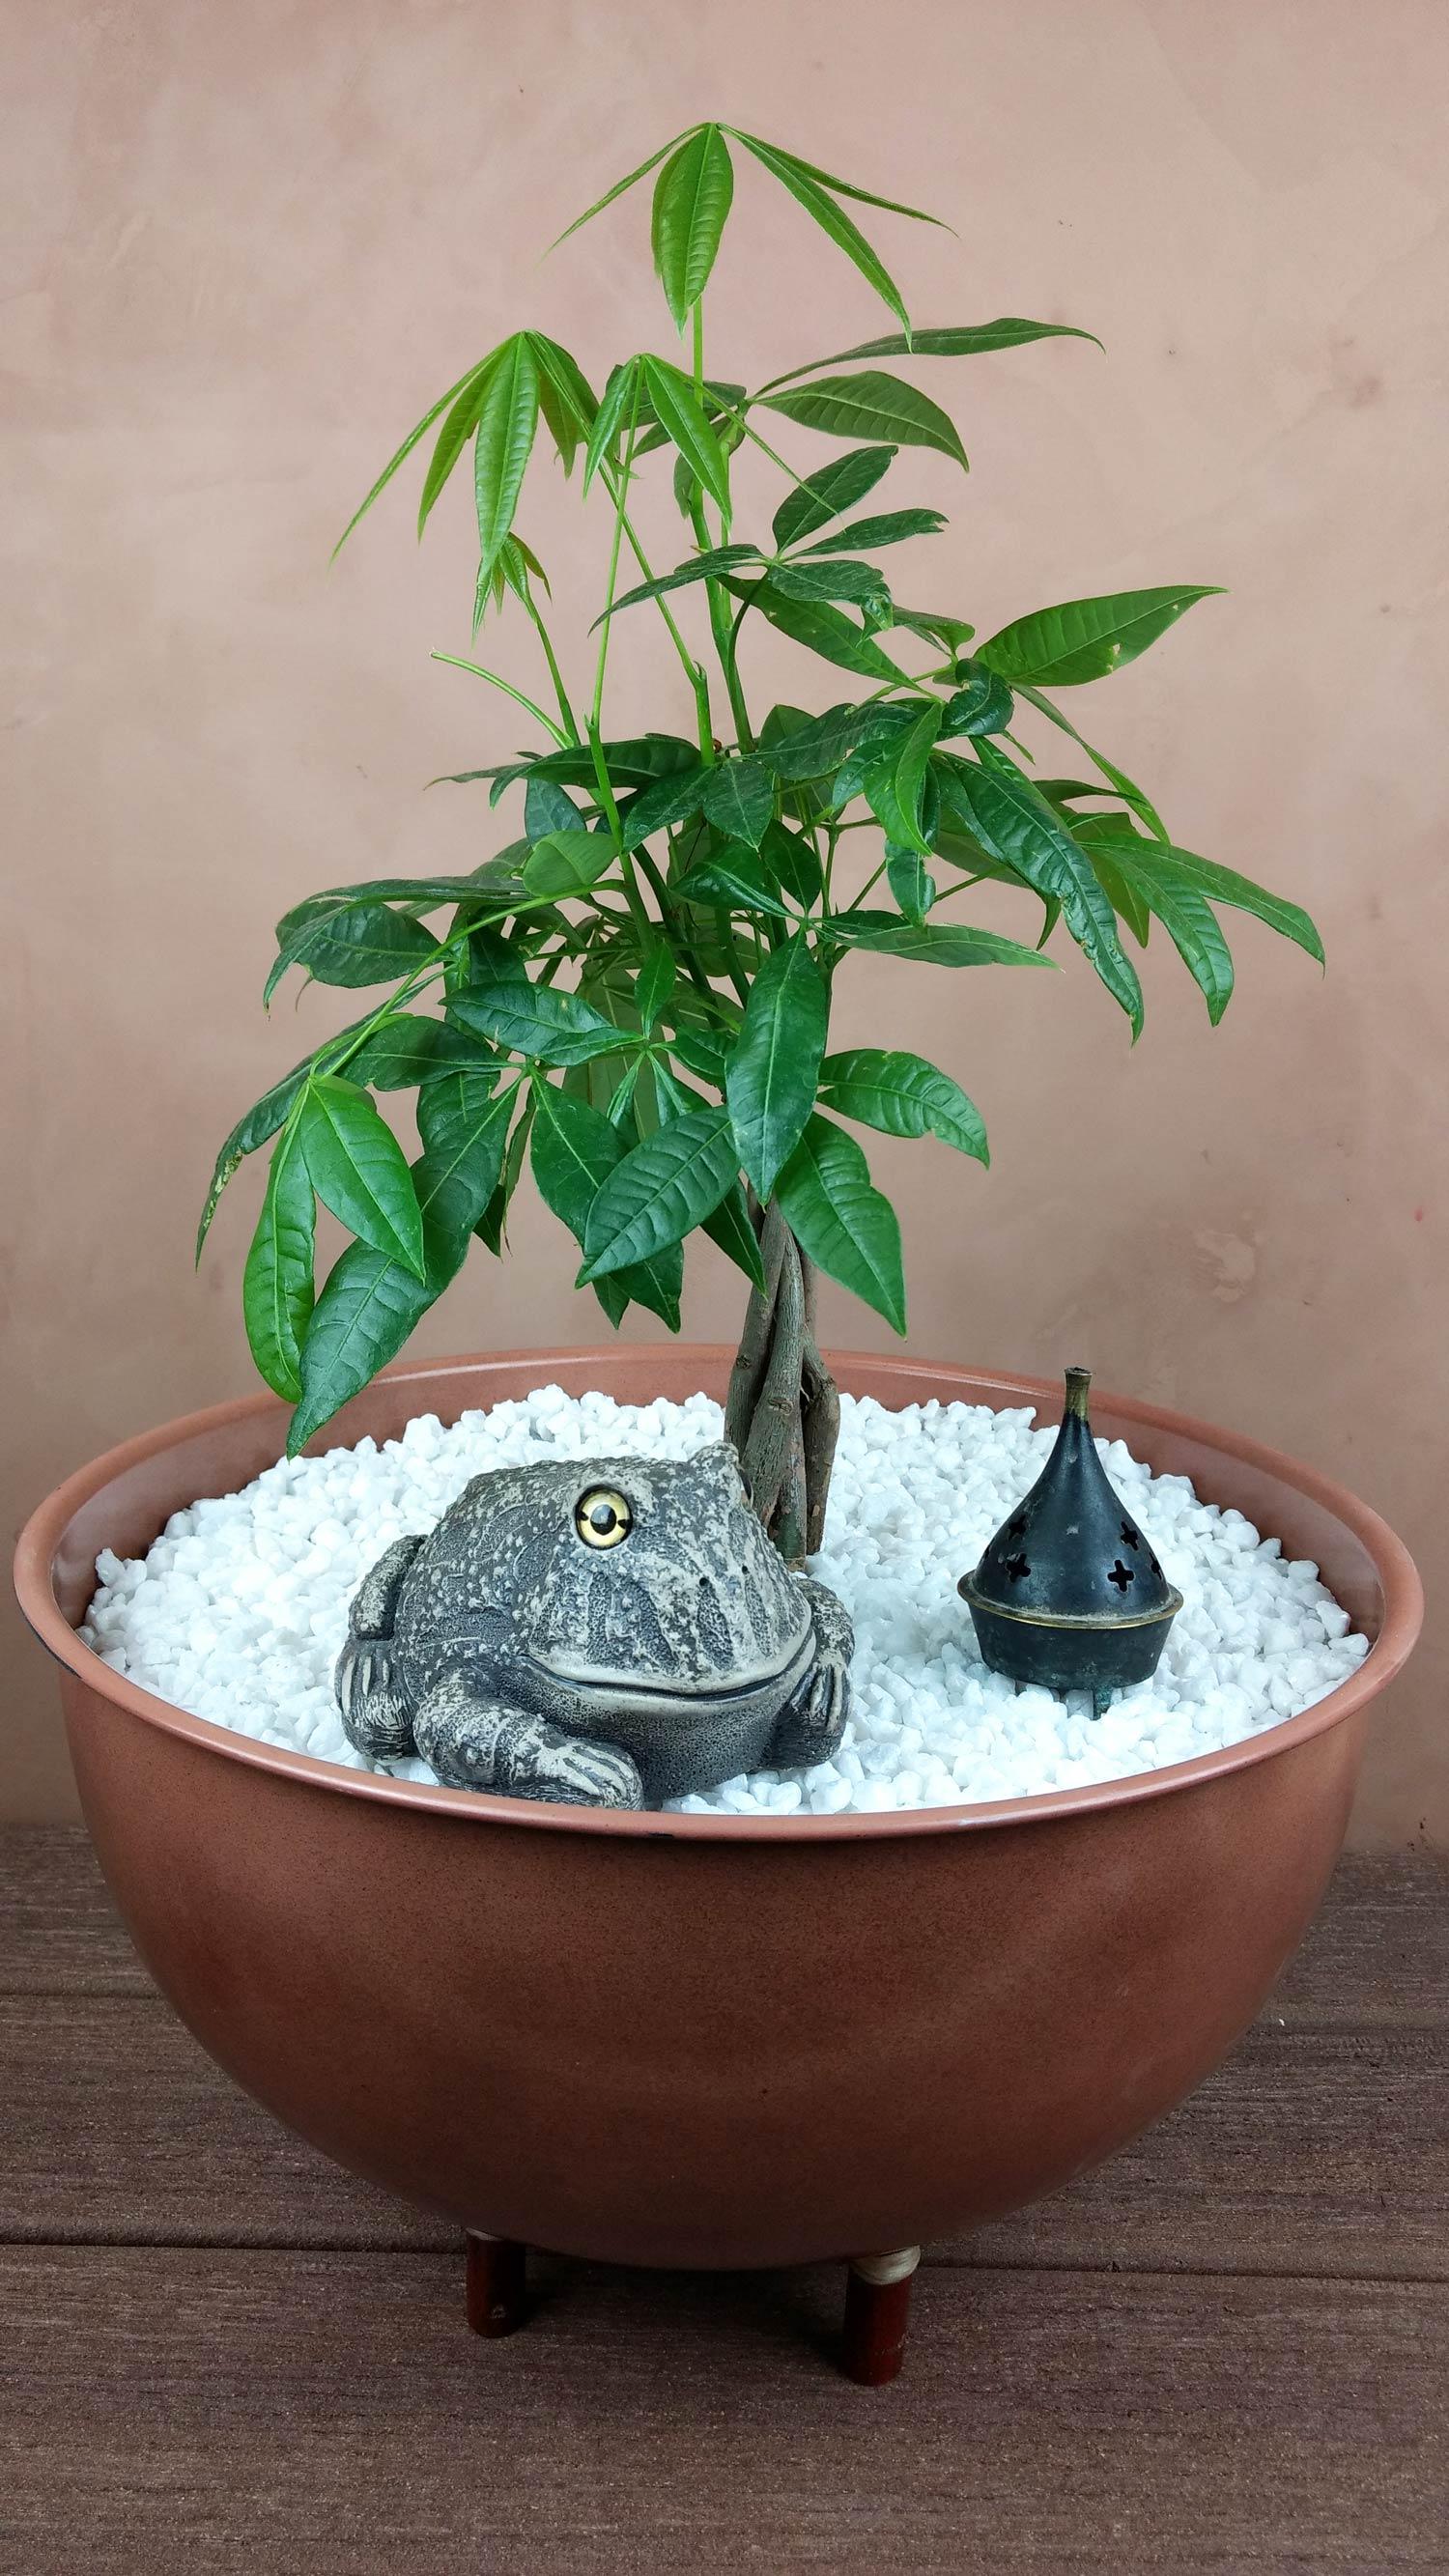 choice-frog-zen-planter-9.jpg